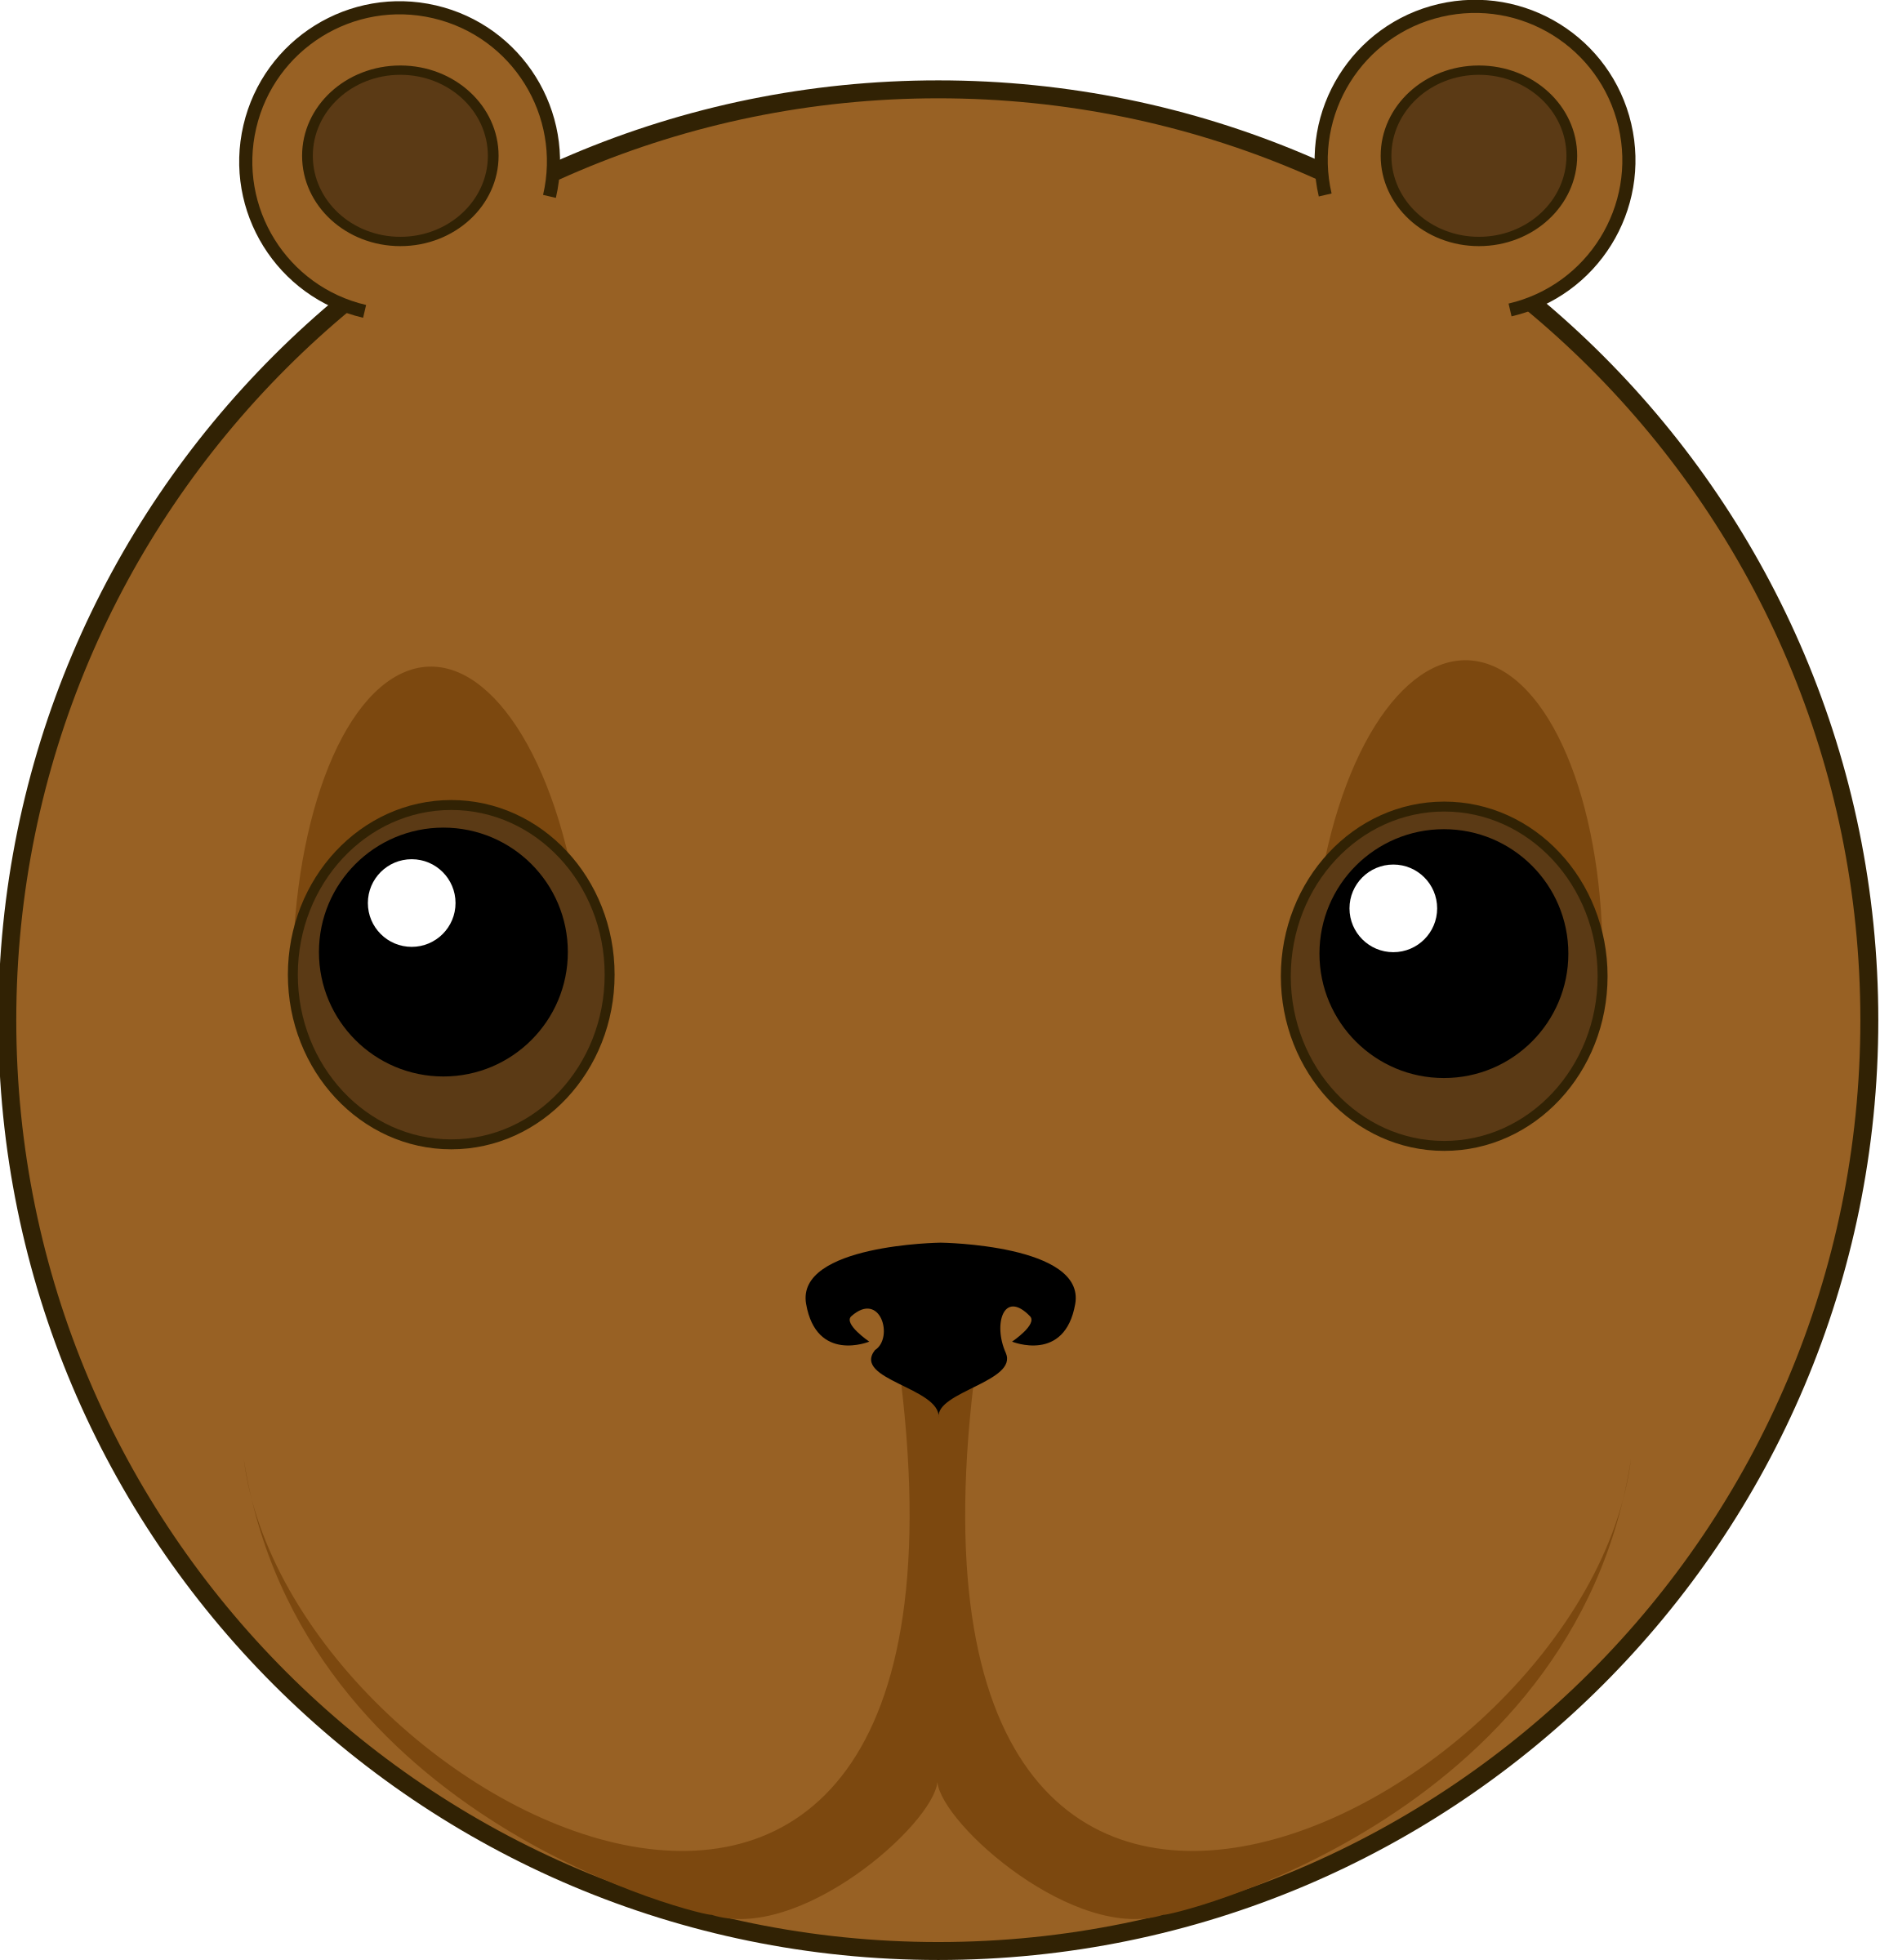 Groundhog clipart cute. Bear head big image